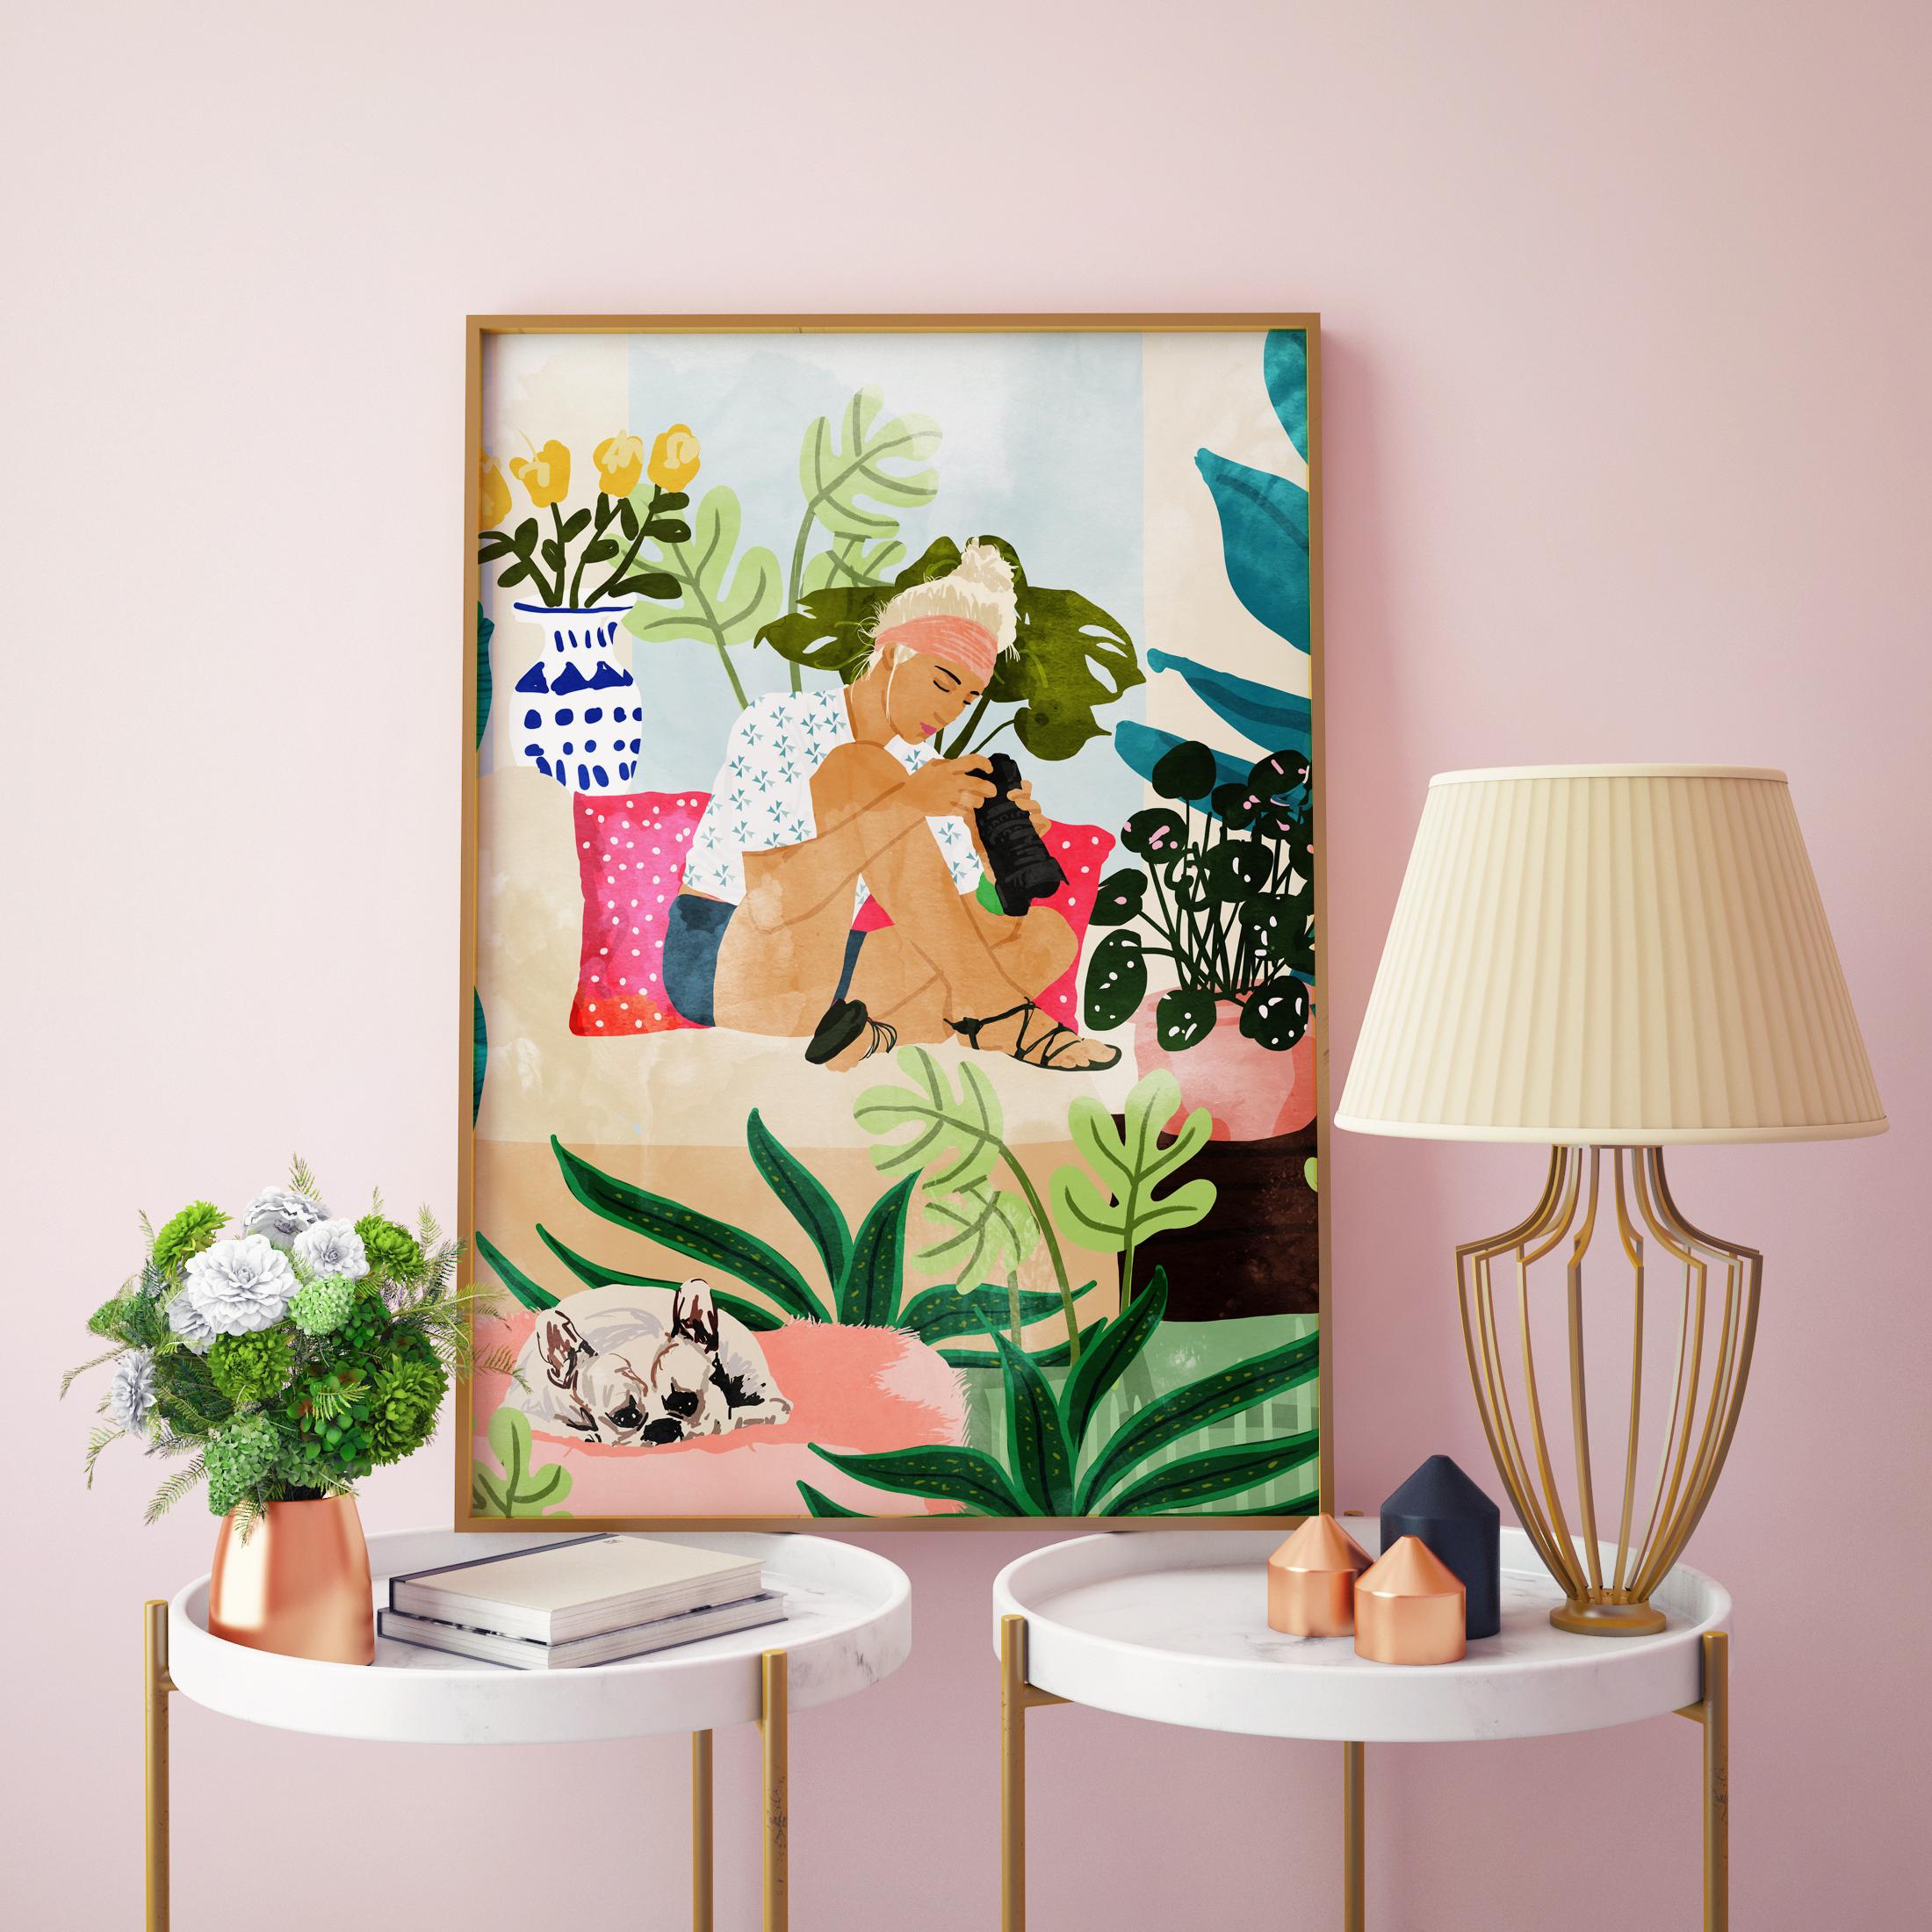 Order personalised framed prints on Artwow: Miss Blogger by designer Uma Prabhakar Gokhale